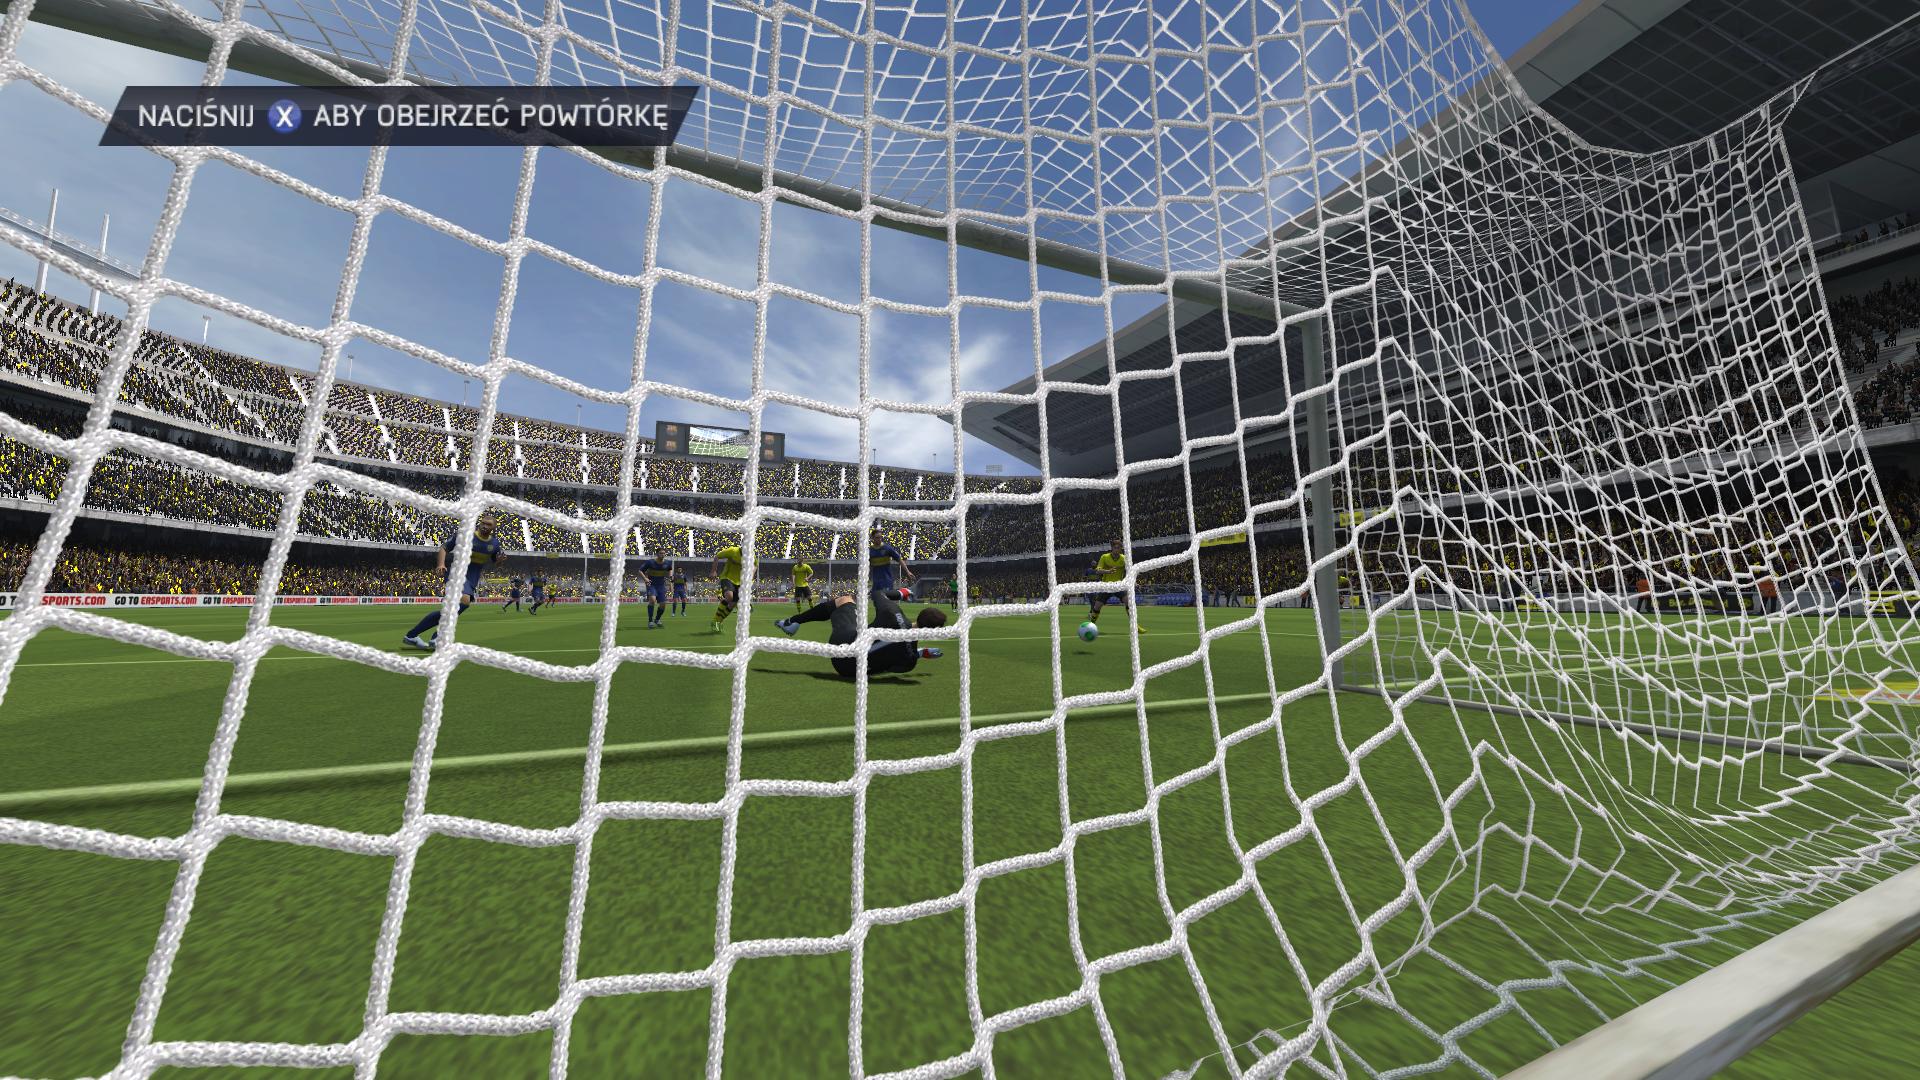 Widok zza bramki w FIFA 14